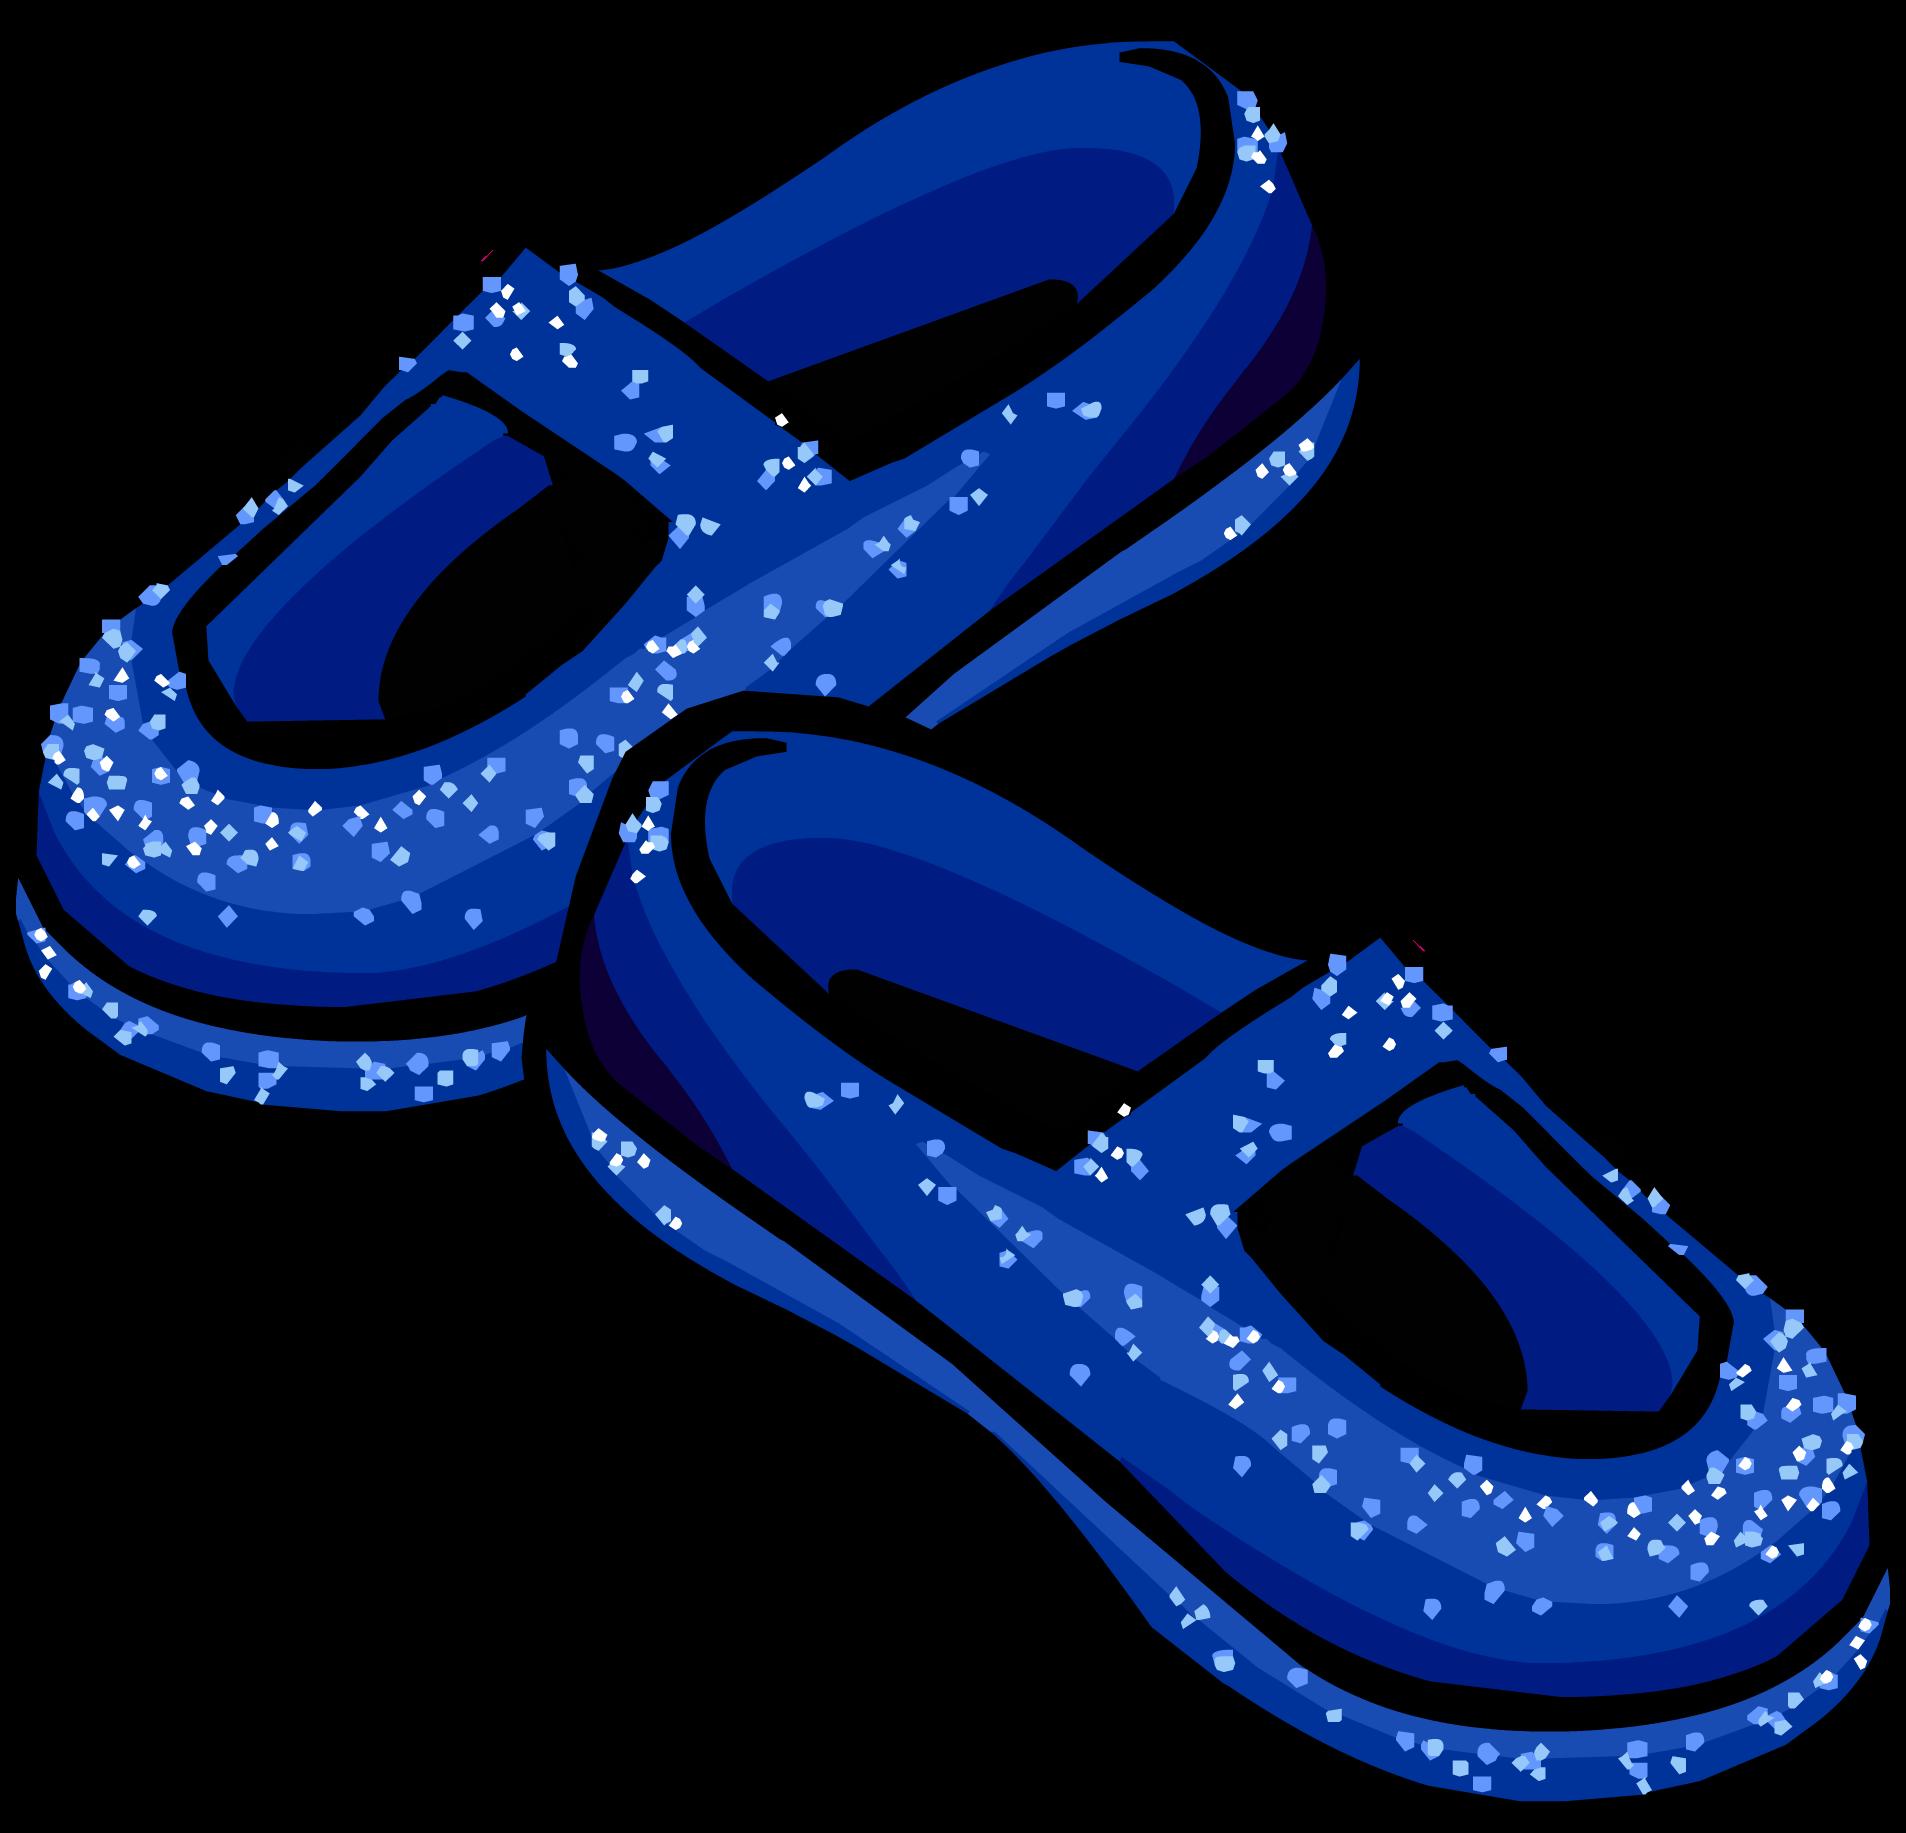 banner transparent Sparkles clipart stardust. Blue slippers club penguin